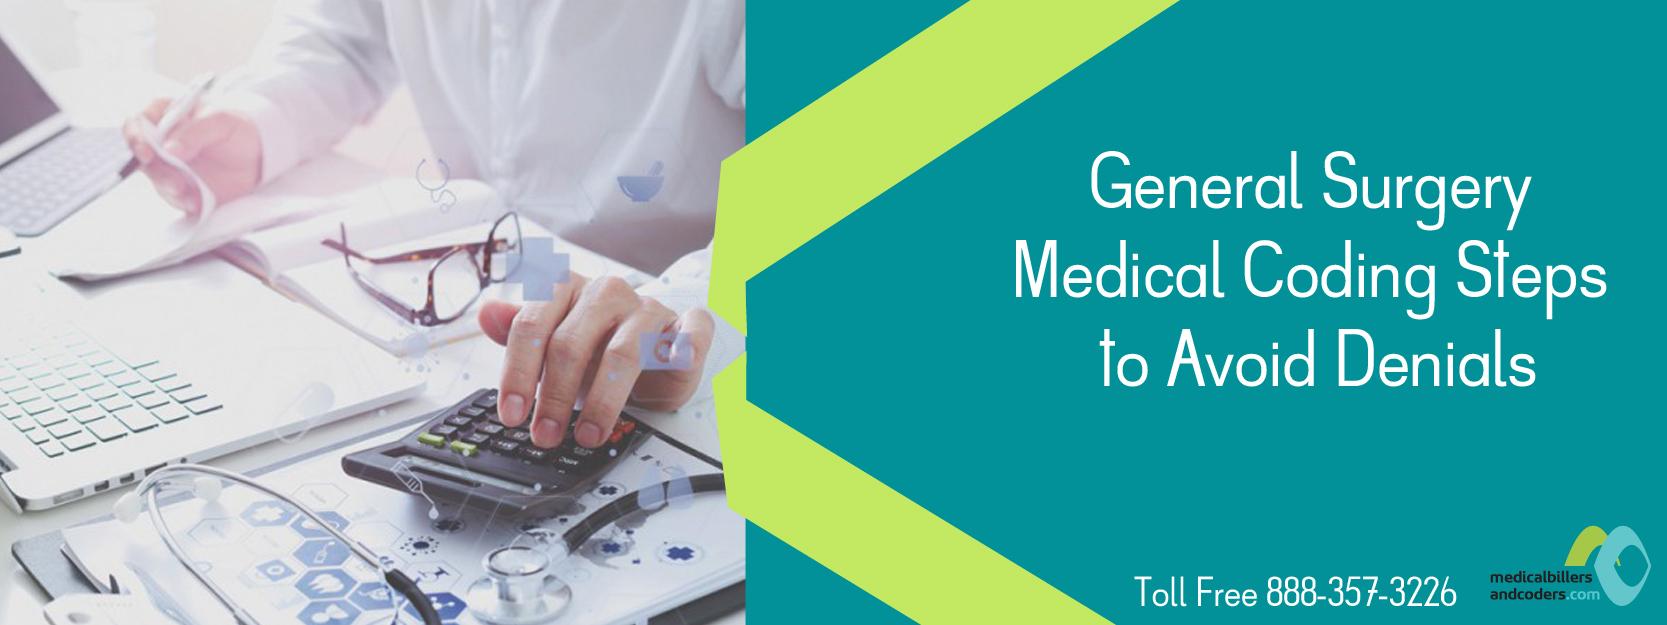 blog-general-surgery-medical-coding-steps-to-avoid-denials